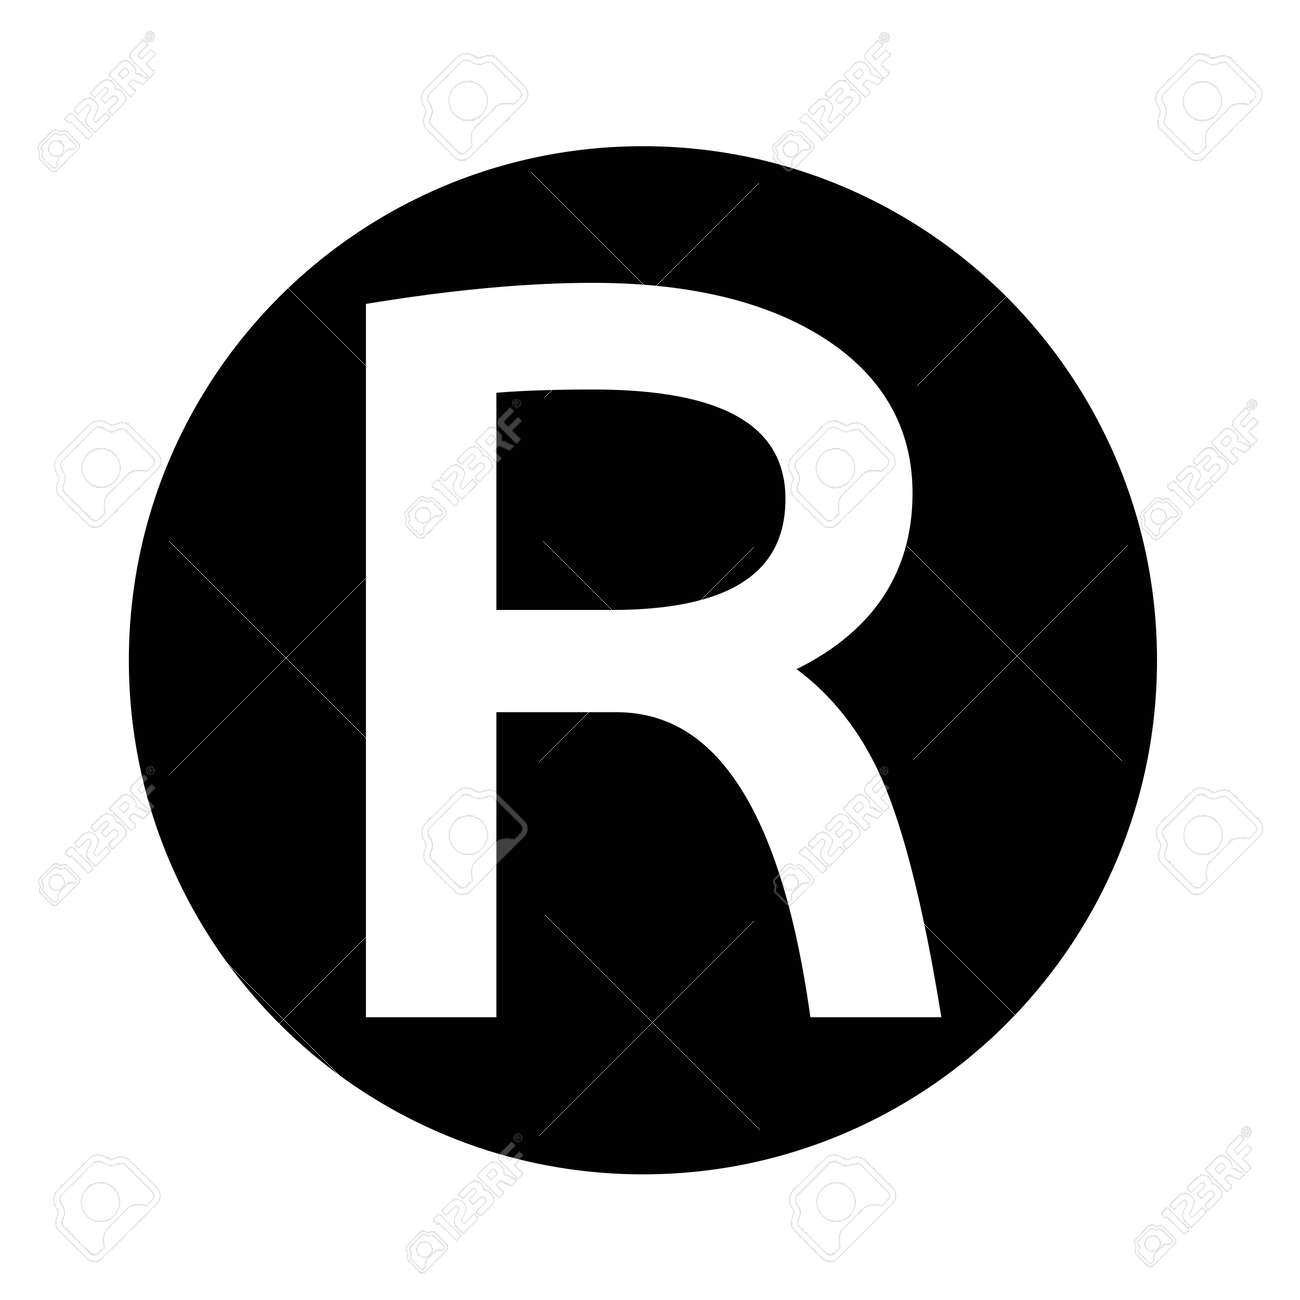 Trademark Symbols Or Registered Trademark Dinocrofo